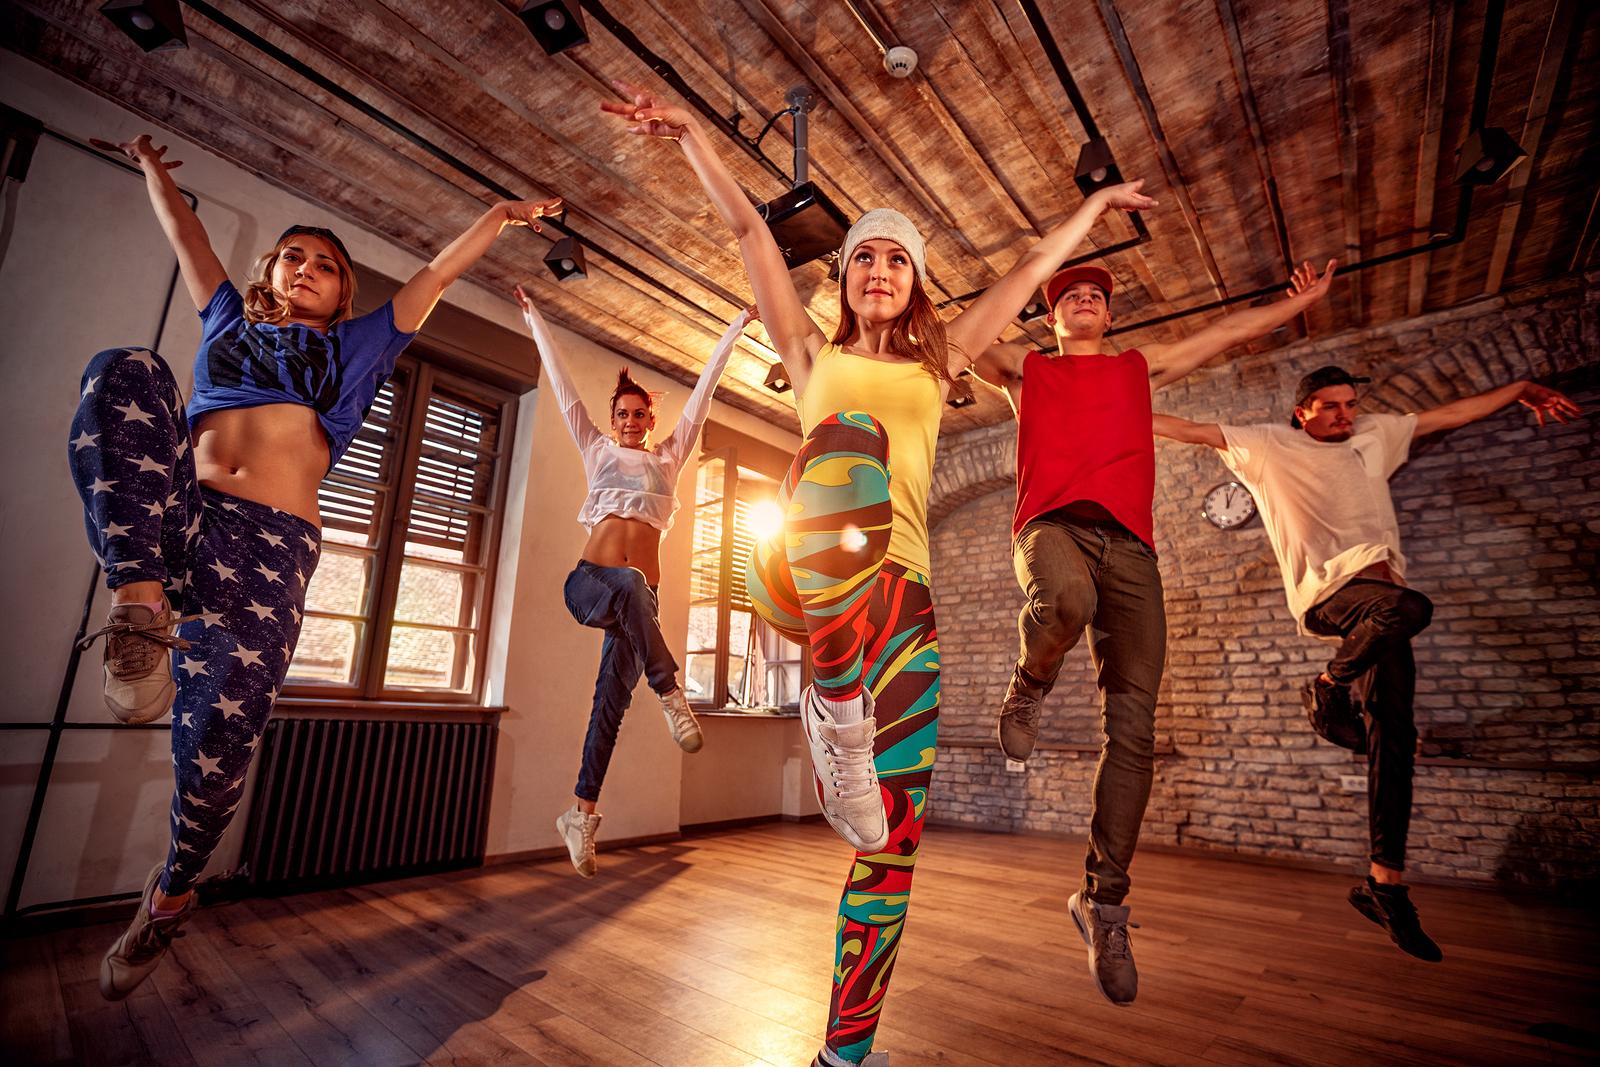 bigstock-young-modern-dancing-group-pra-228745360.jpg